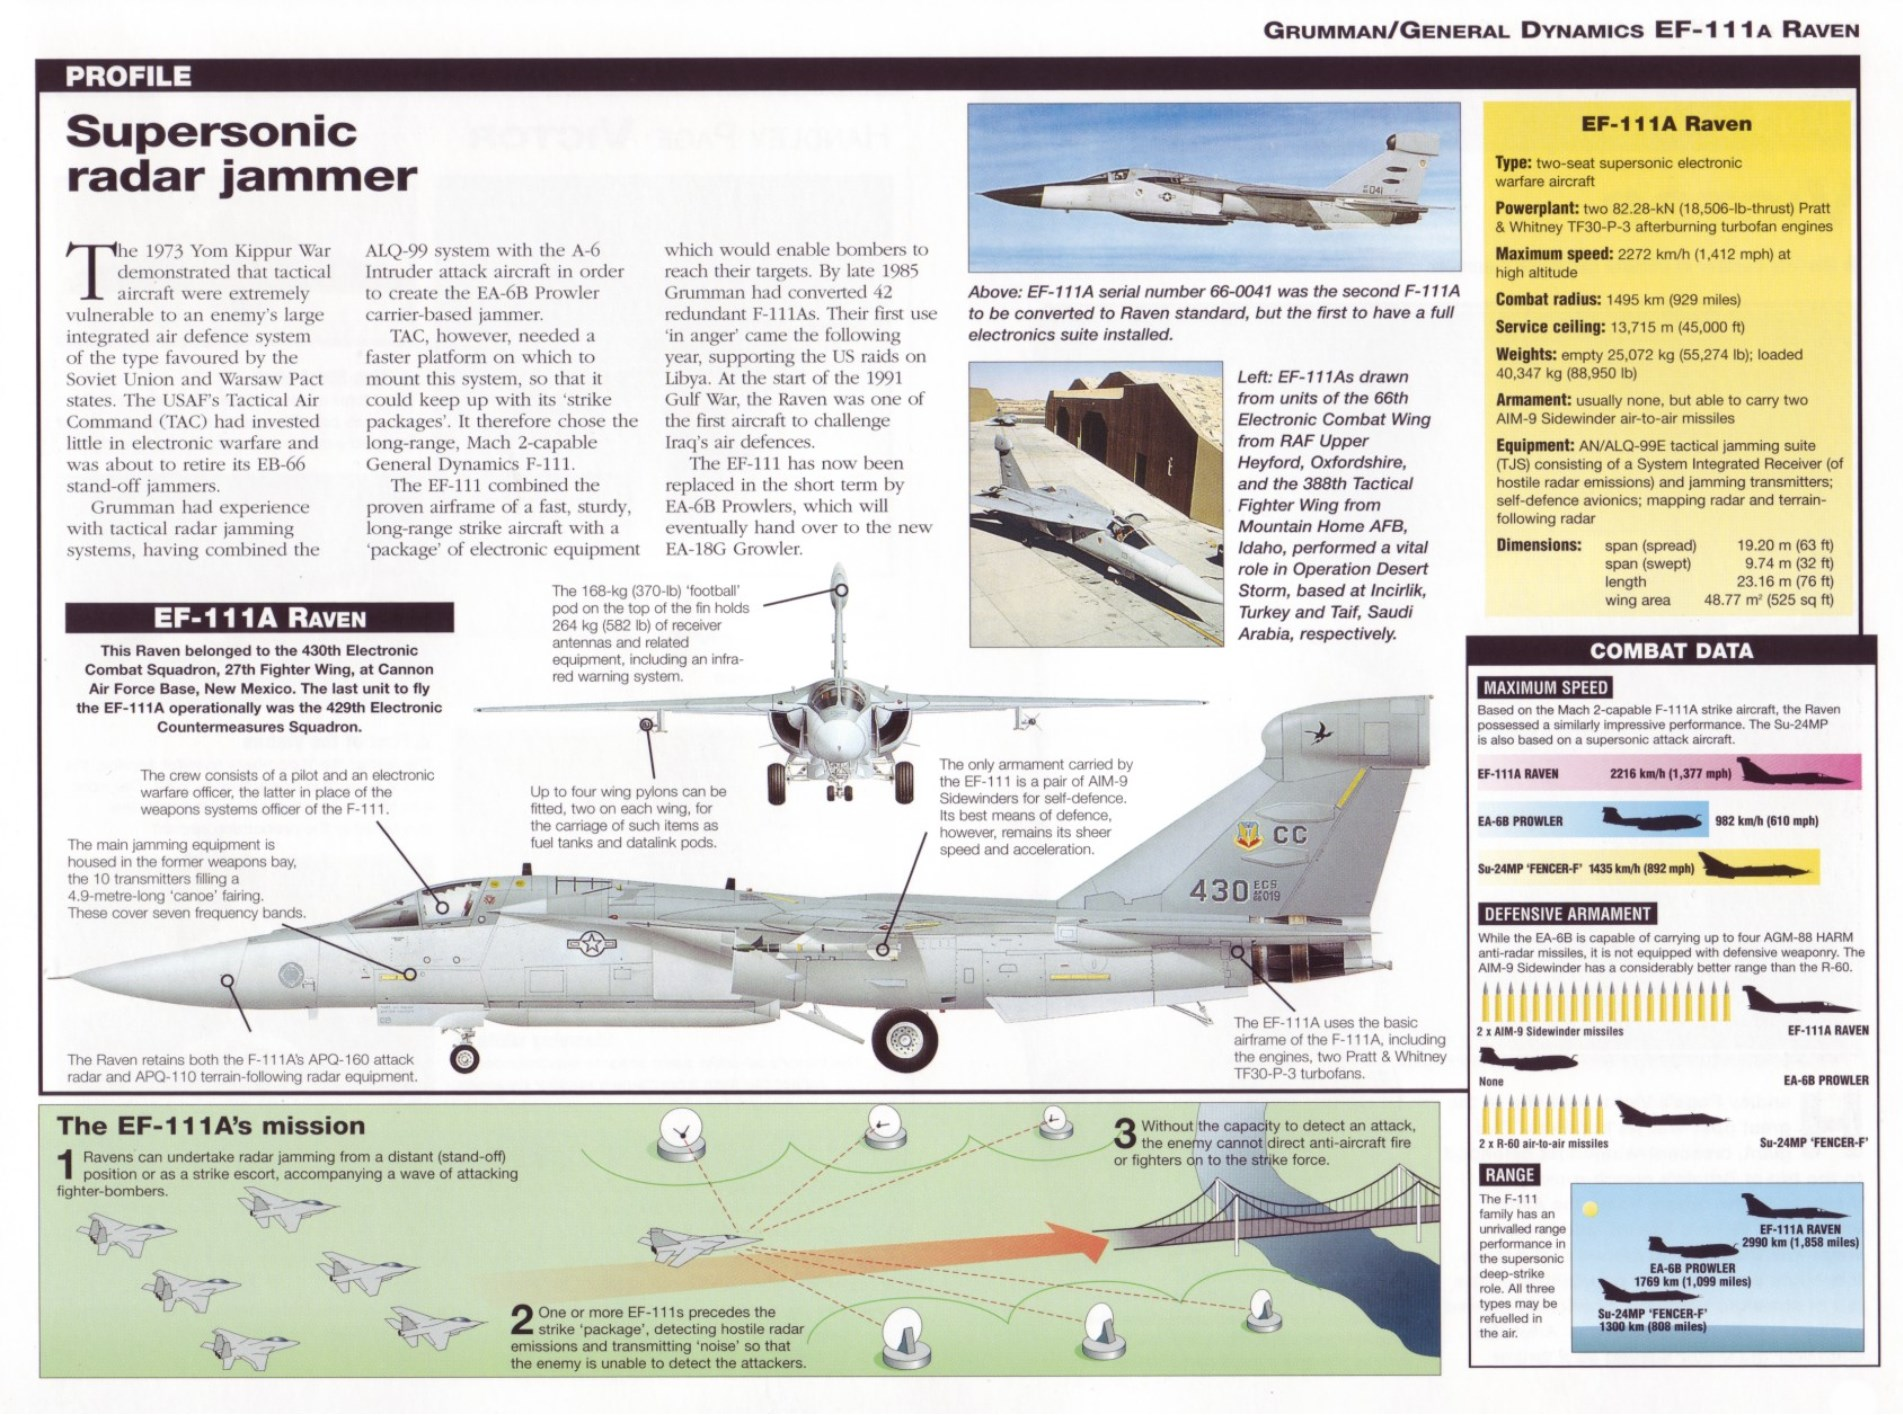 Grumman/General Dynamics EF-111 Raven   Weapons and Warfare